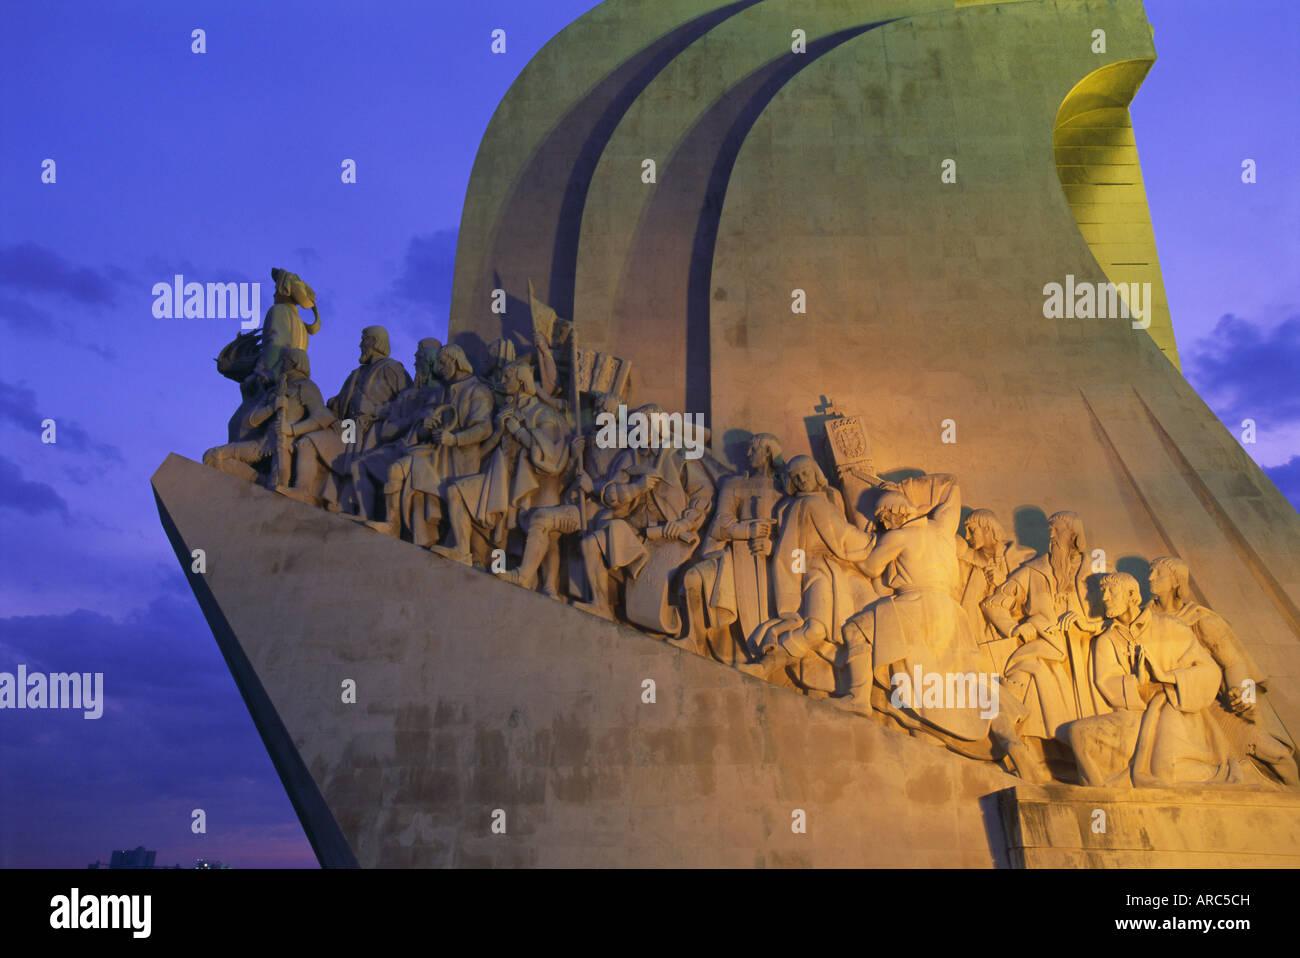 Denkmal der Entdeckungen, Lissabon, Portugal, Europa Stockbild